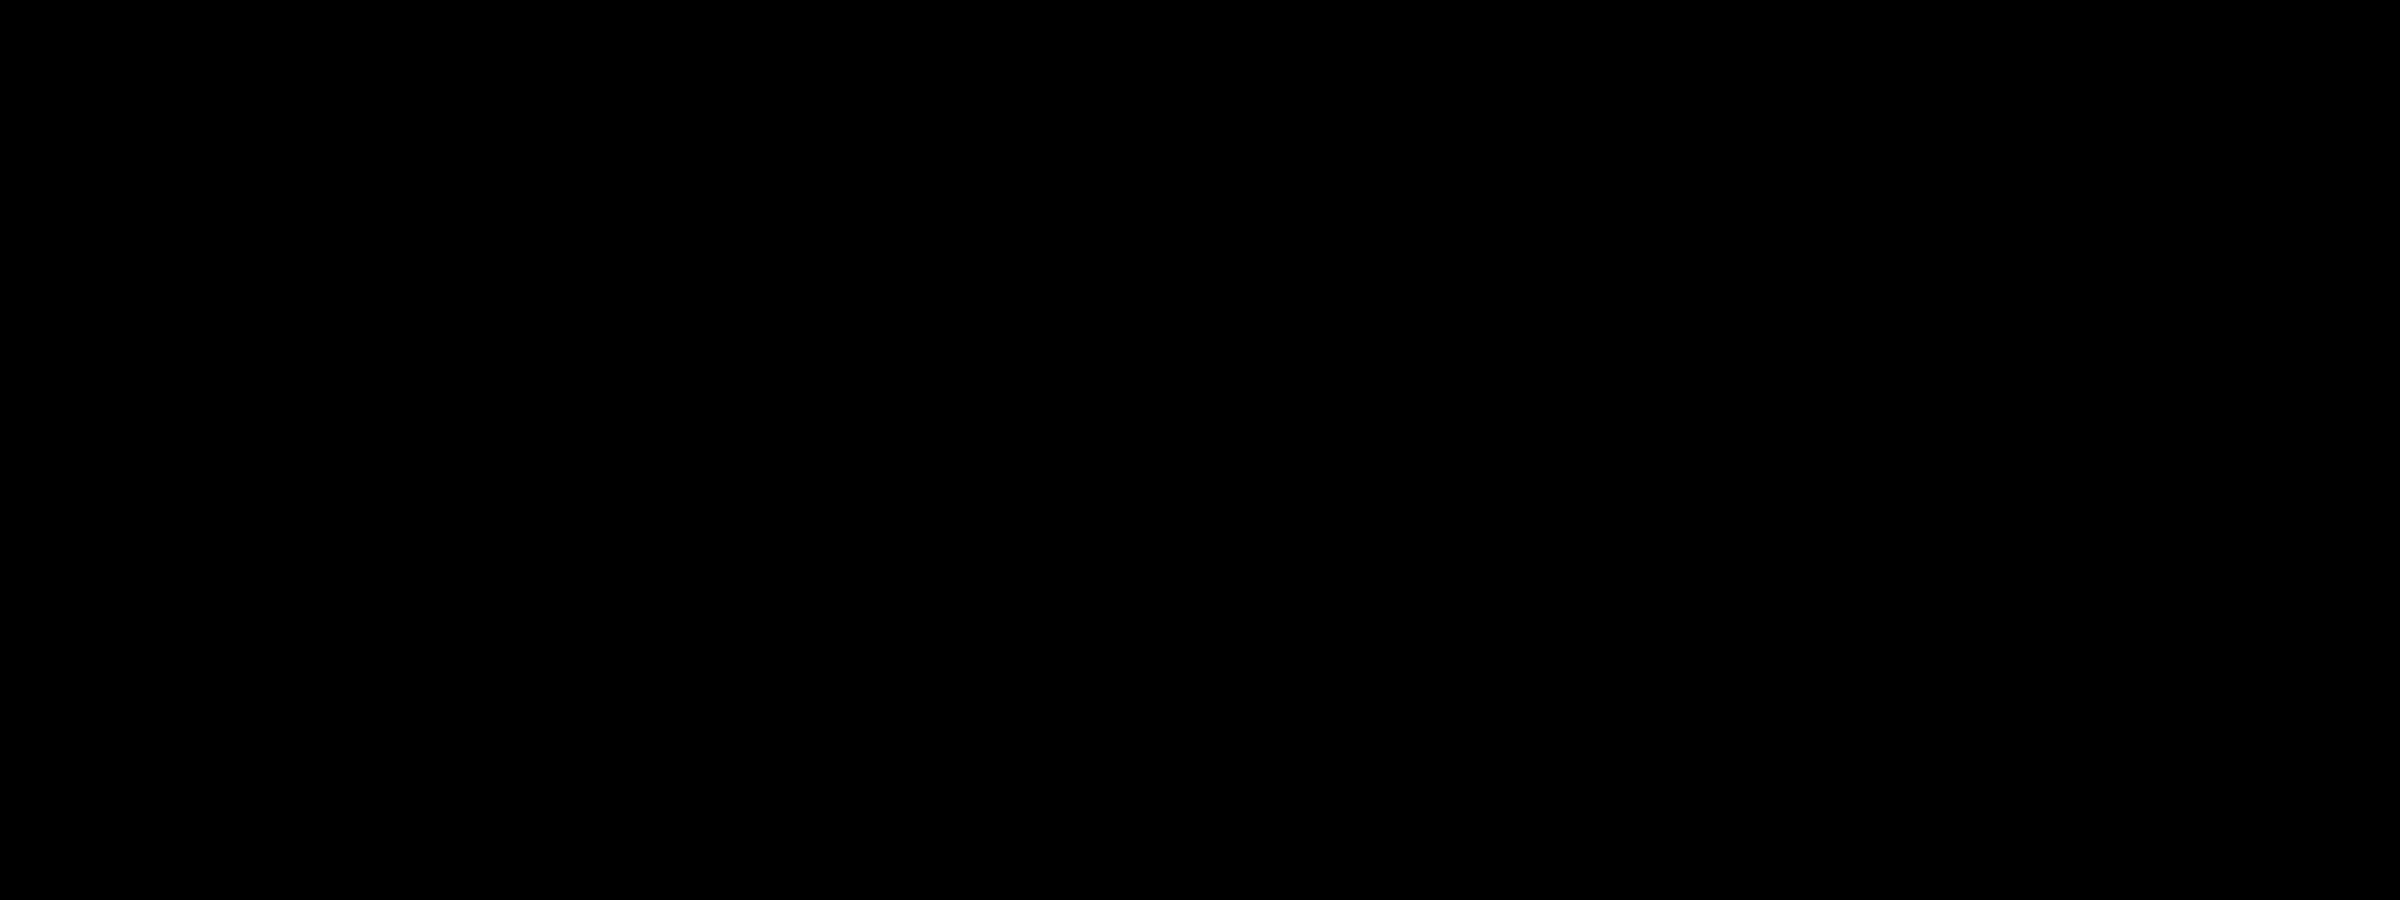 2400x900 Clip Art Banner Clipart Free Microsoft 2